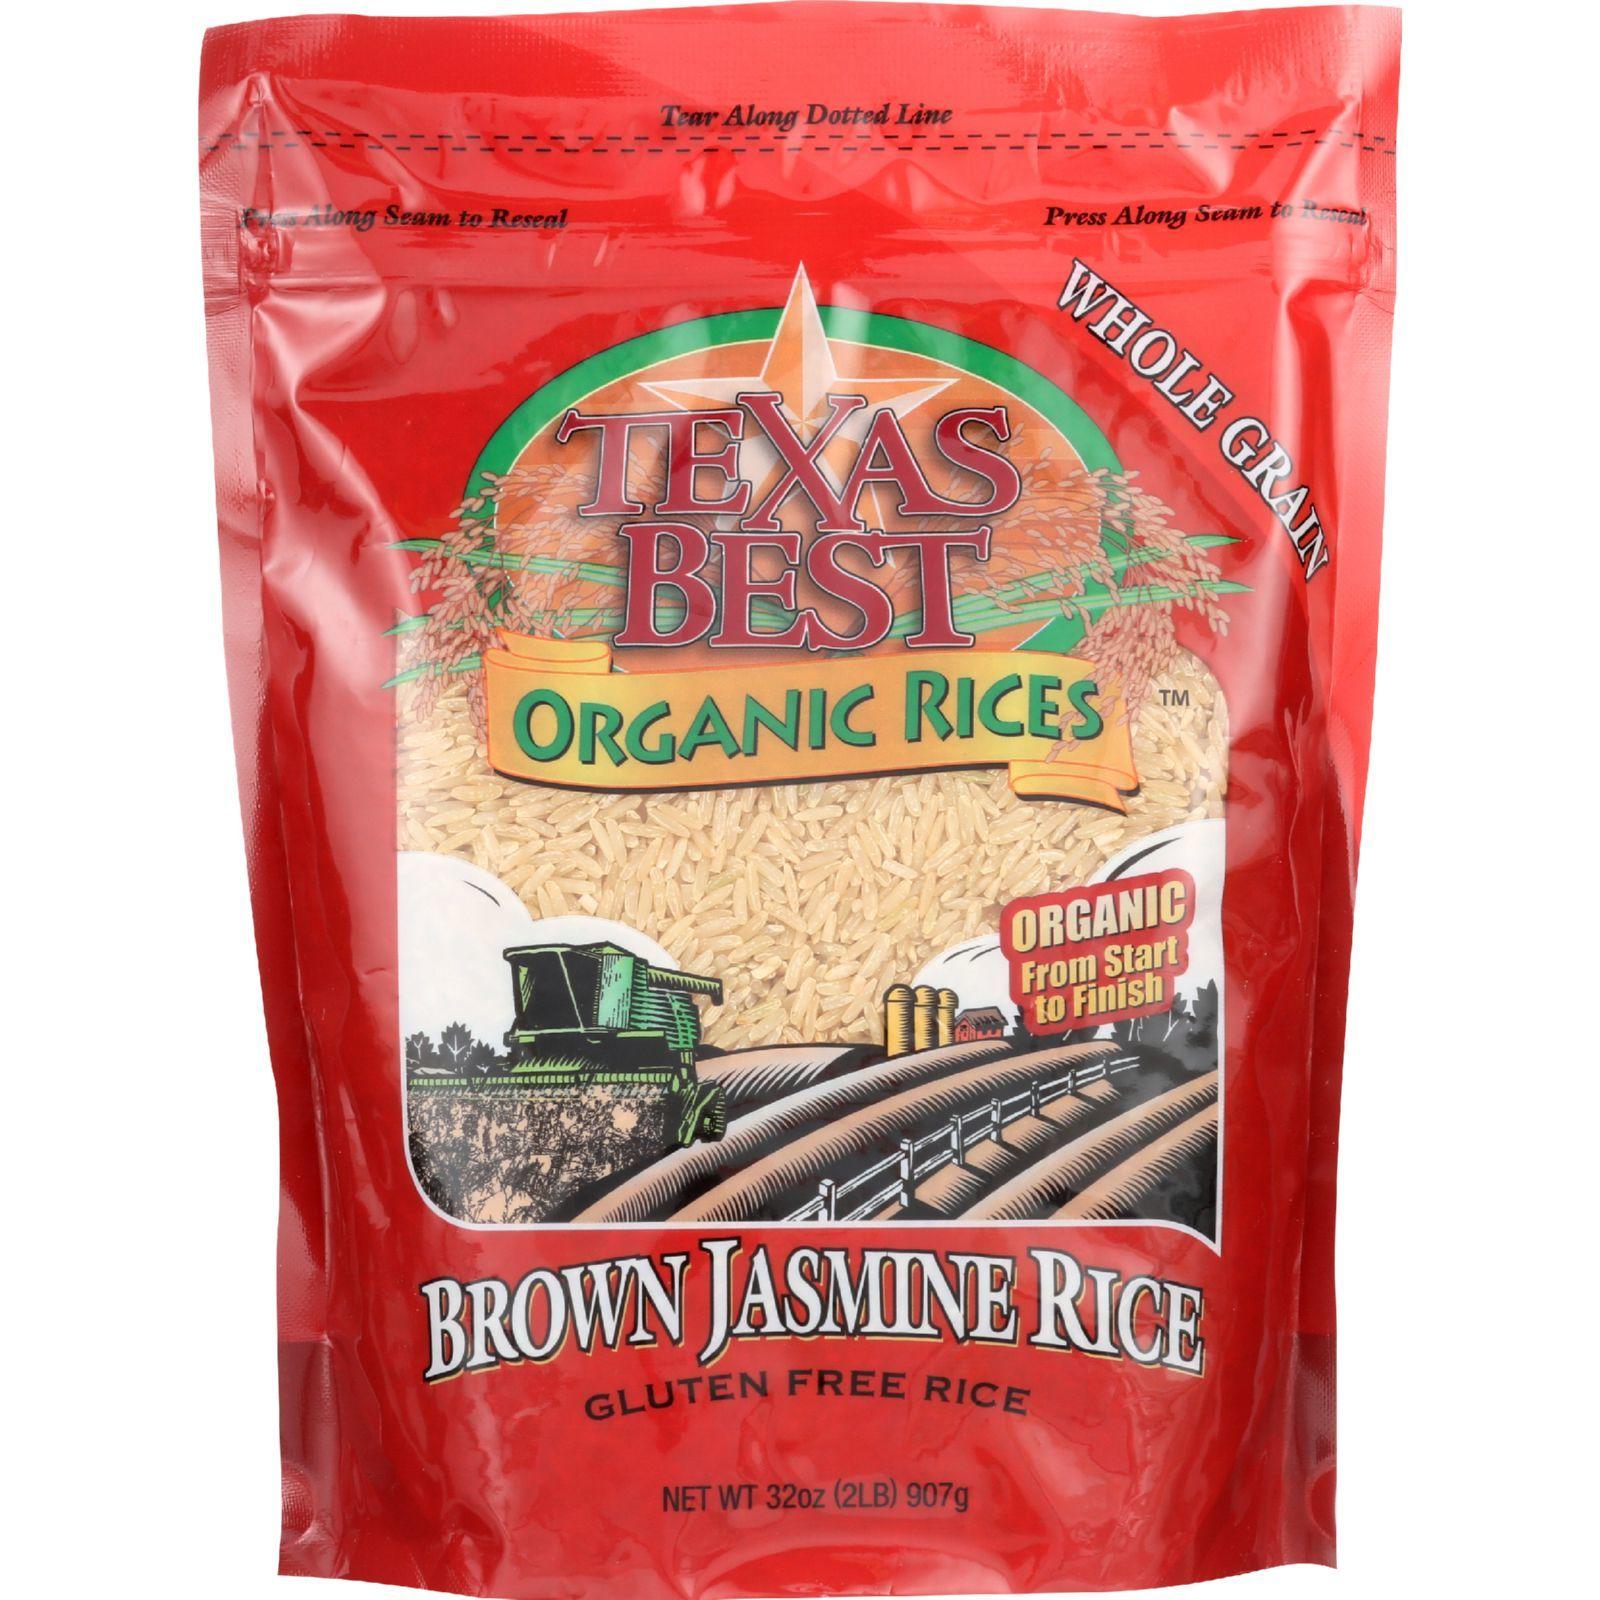 Texas Best Organics Rice - Organic - Jasmine Brown - 32 oz - case of 6